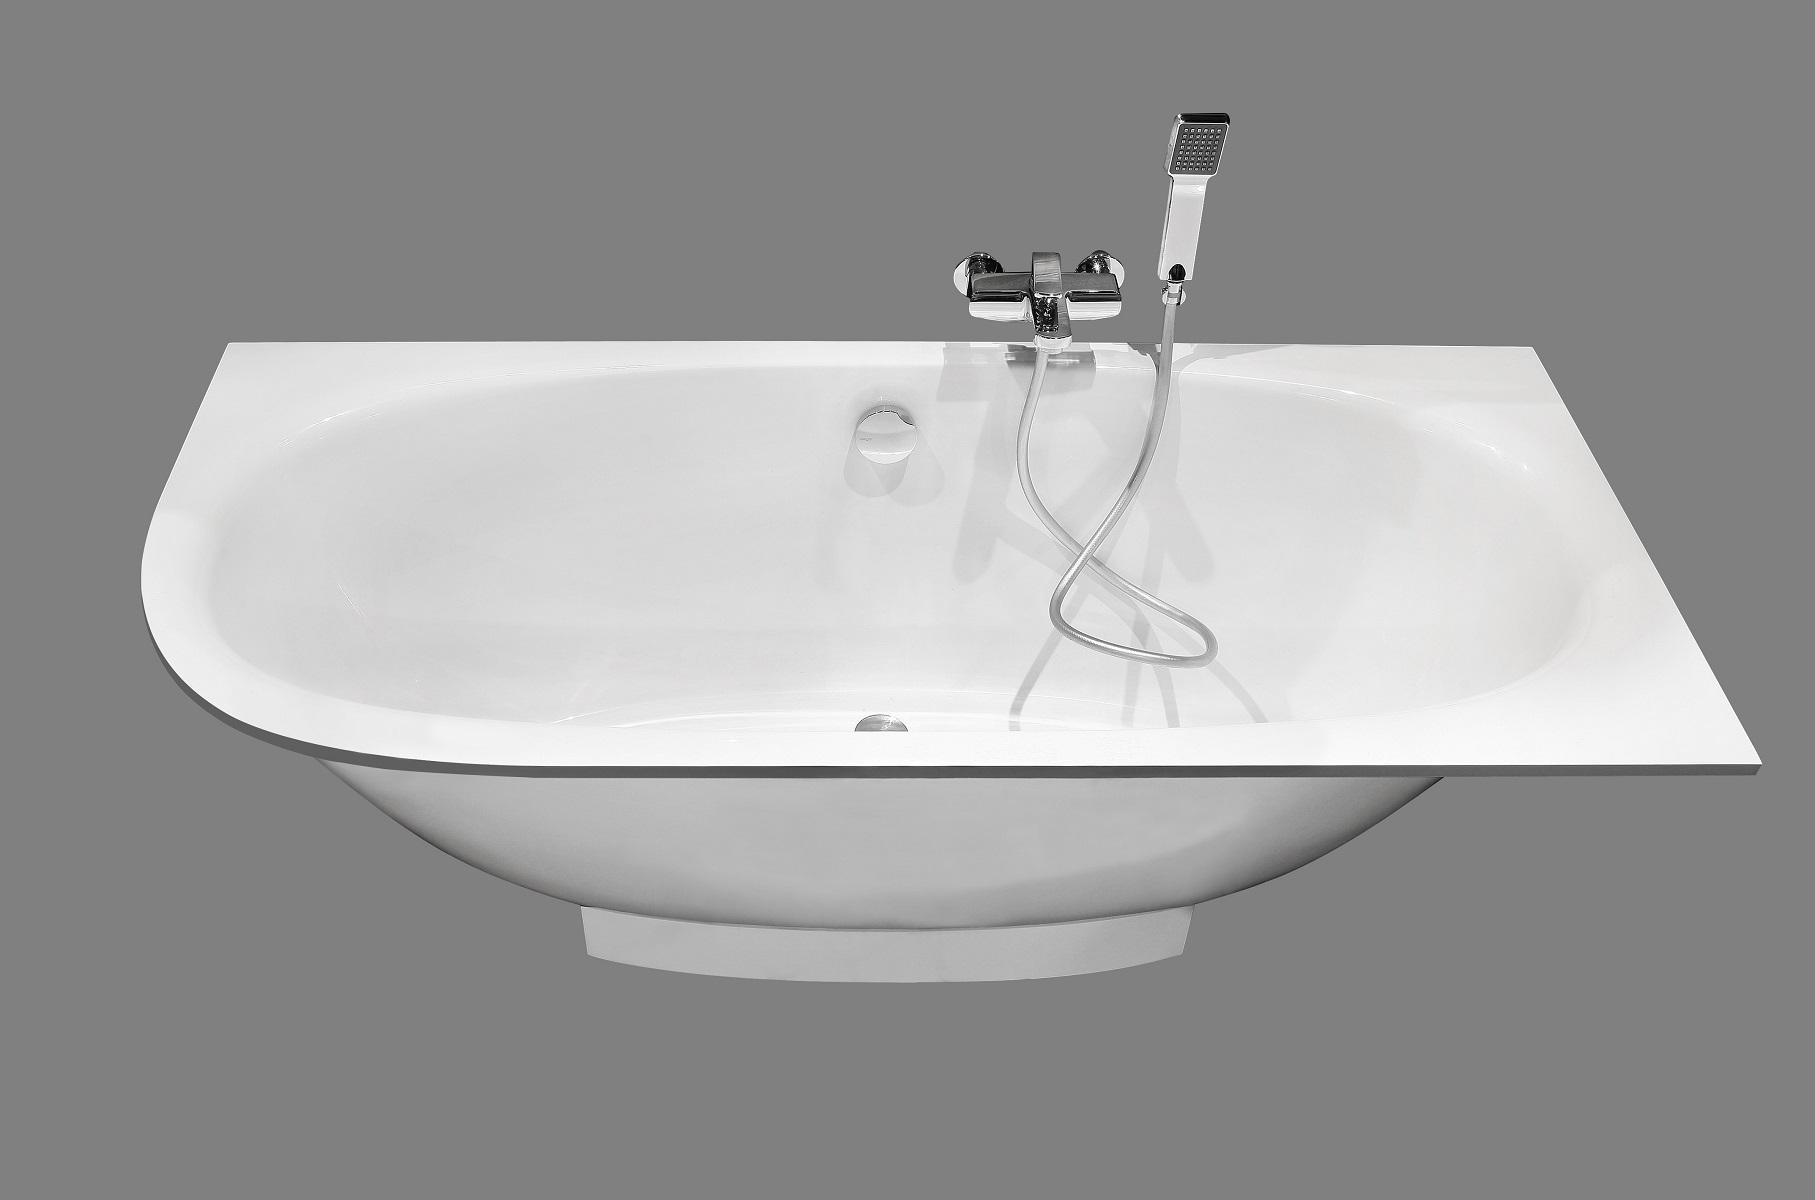 Vasca Da Bagno I Inglese : Homemay pvc adesivi da parete inglese splish scimmia baby bagno